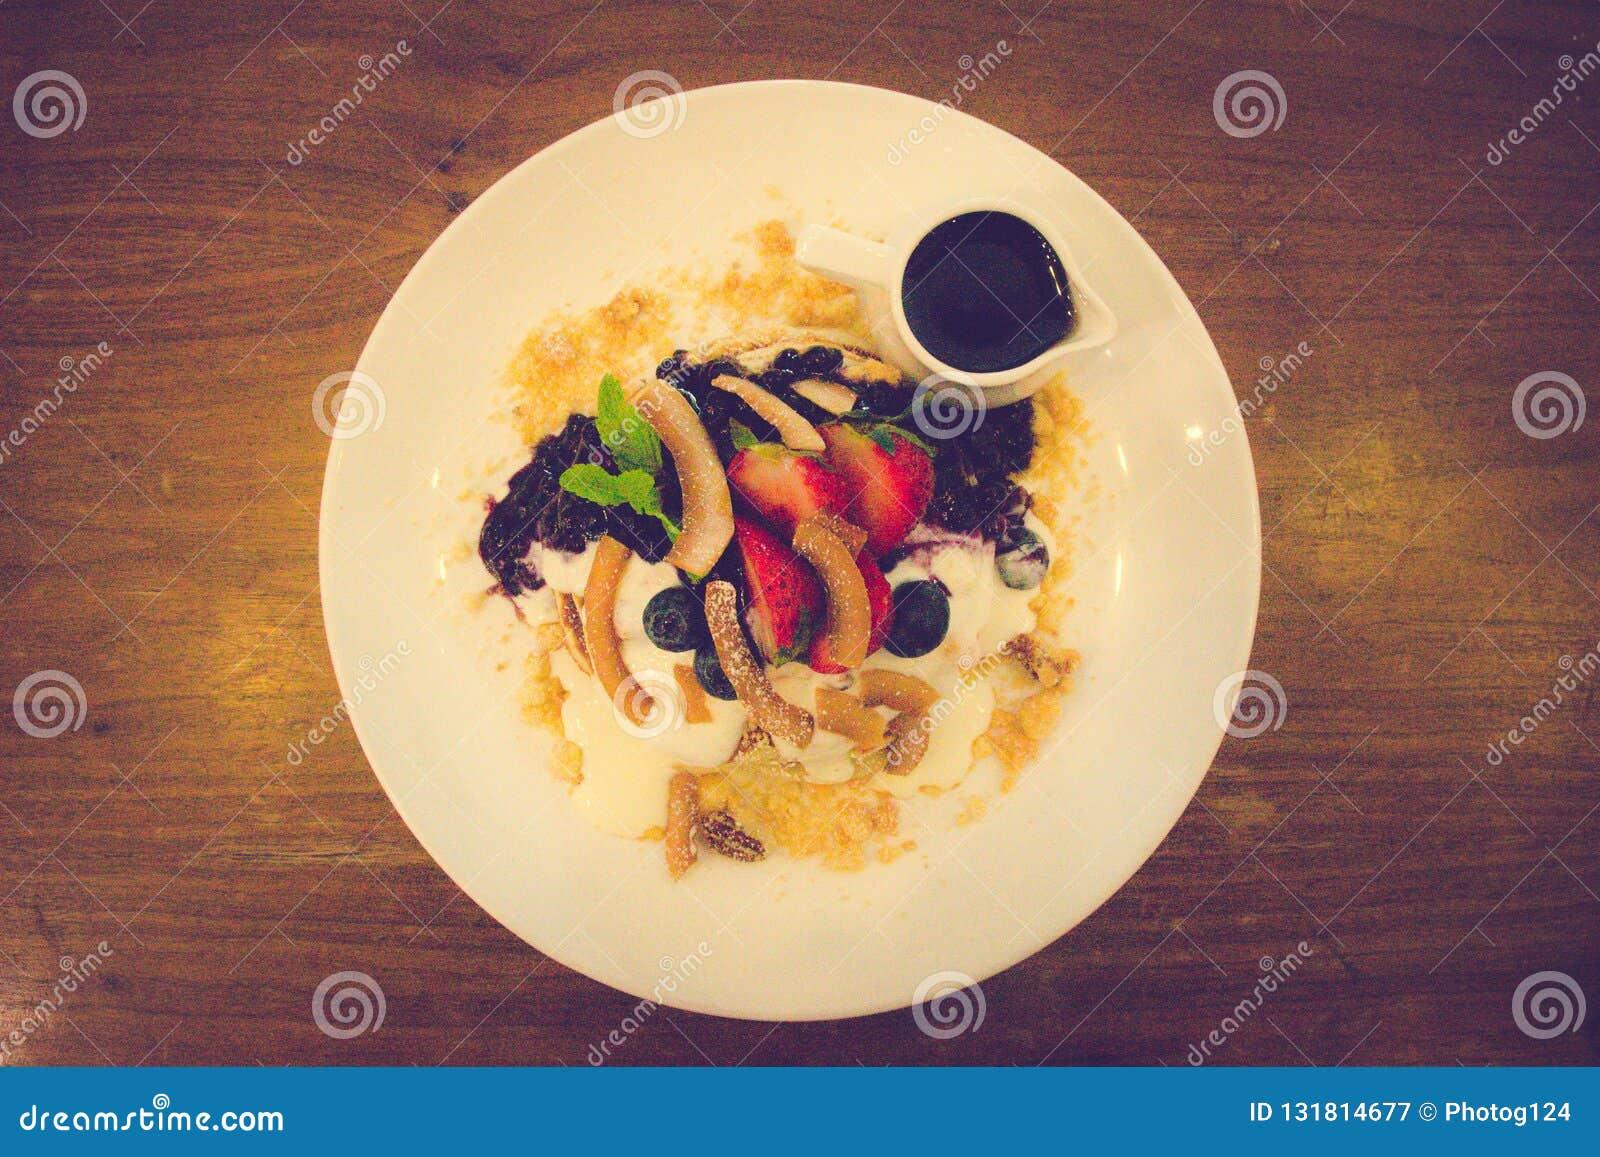 Coconut flour pancakes Blueberry compote, fresh banana whipped greek yoghurt